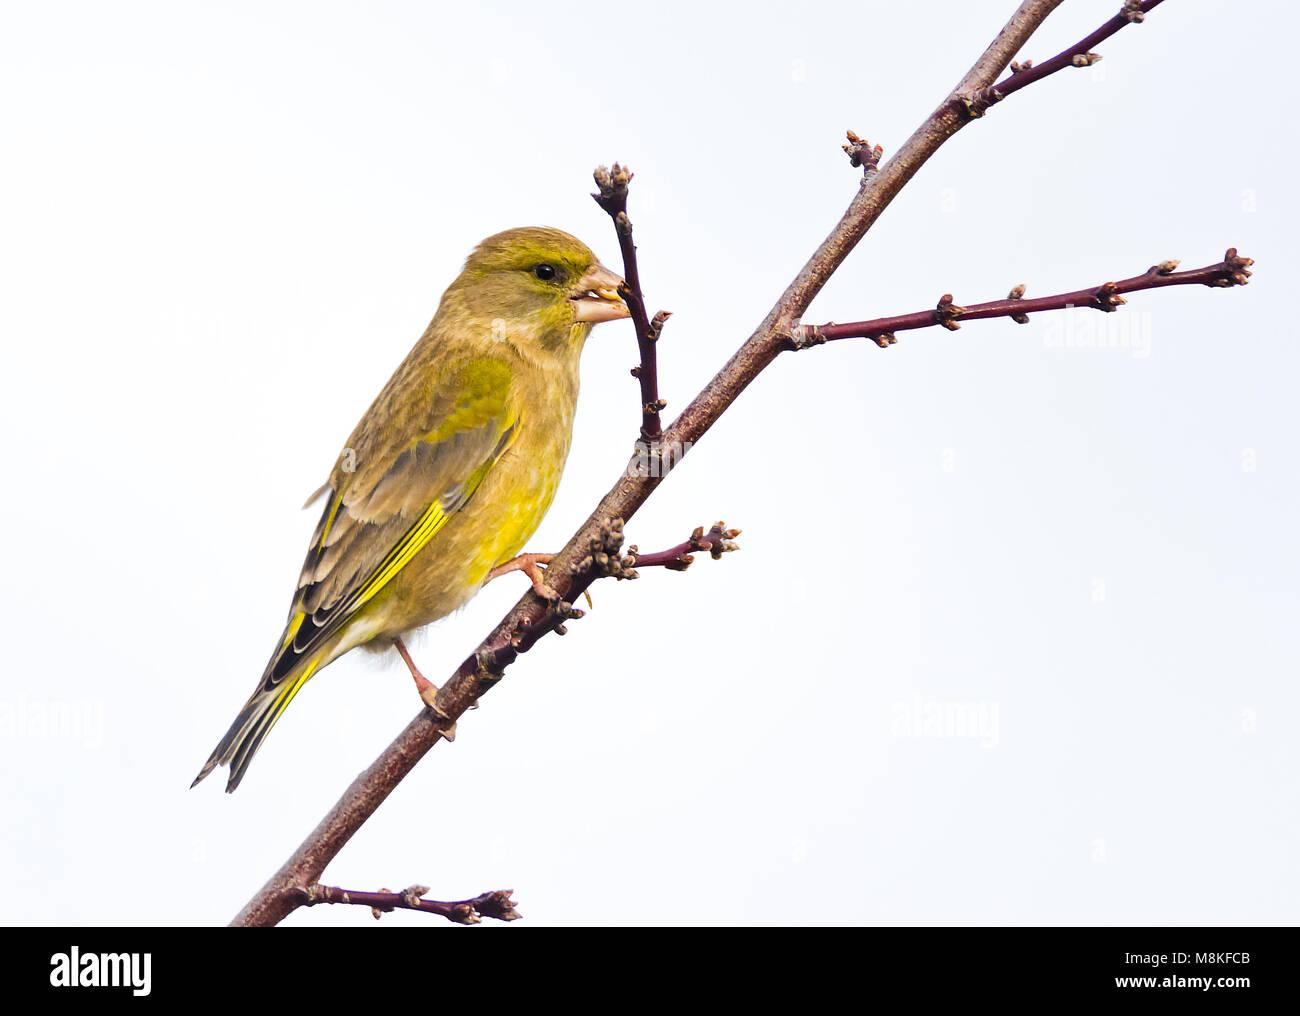 Closeup of a greenfinch (Chloris chloris )sitting on a twig - Stock Image